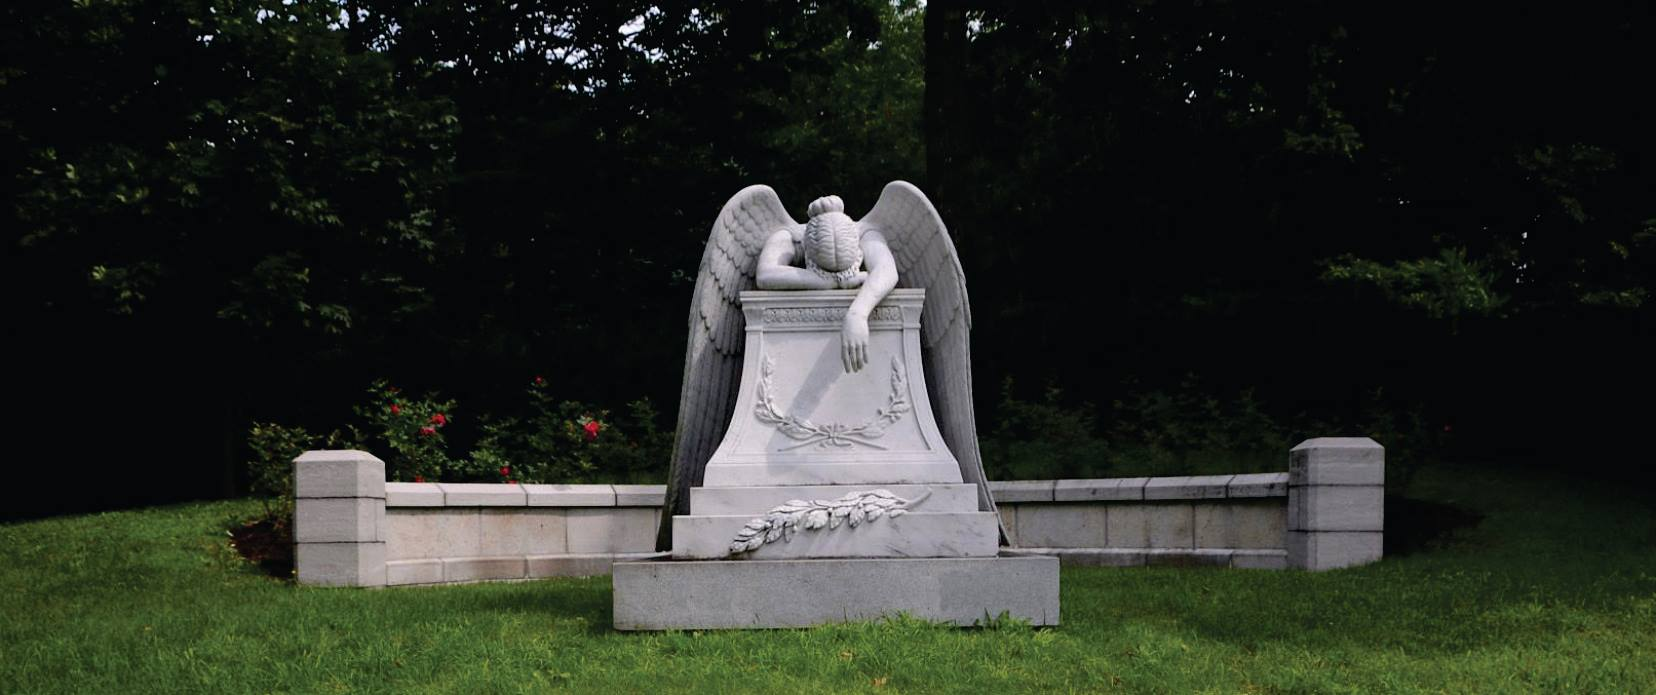 Weeping Angel - Montreal - Marble